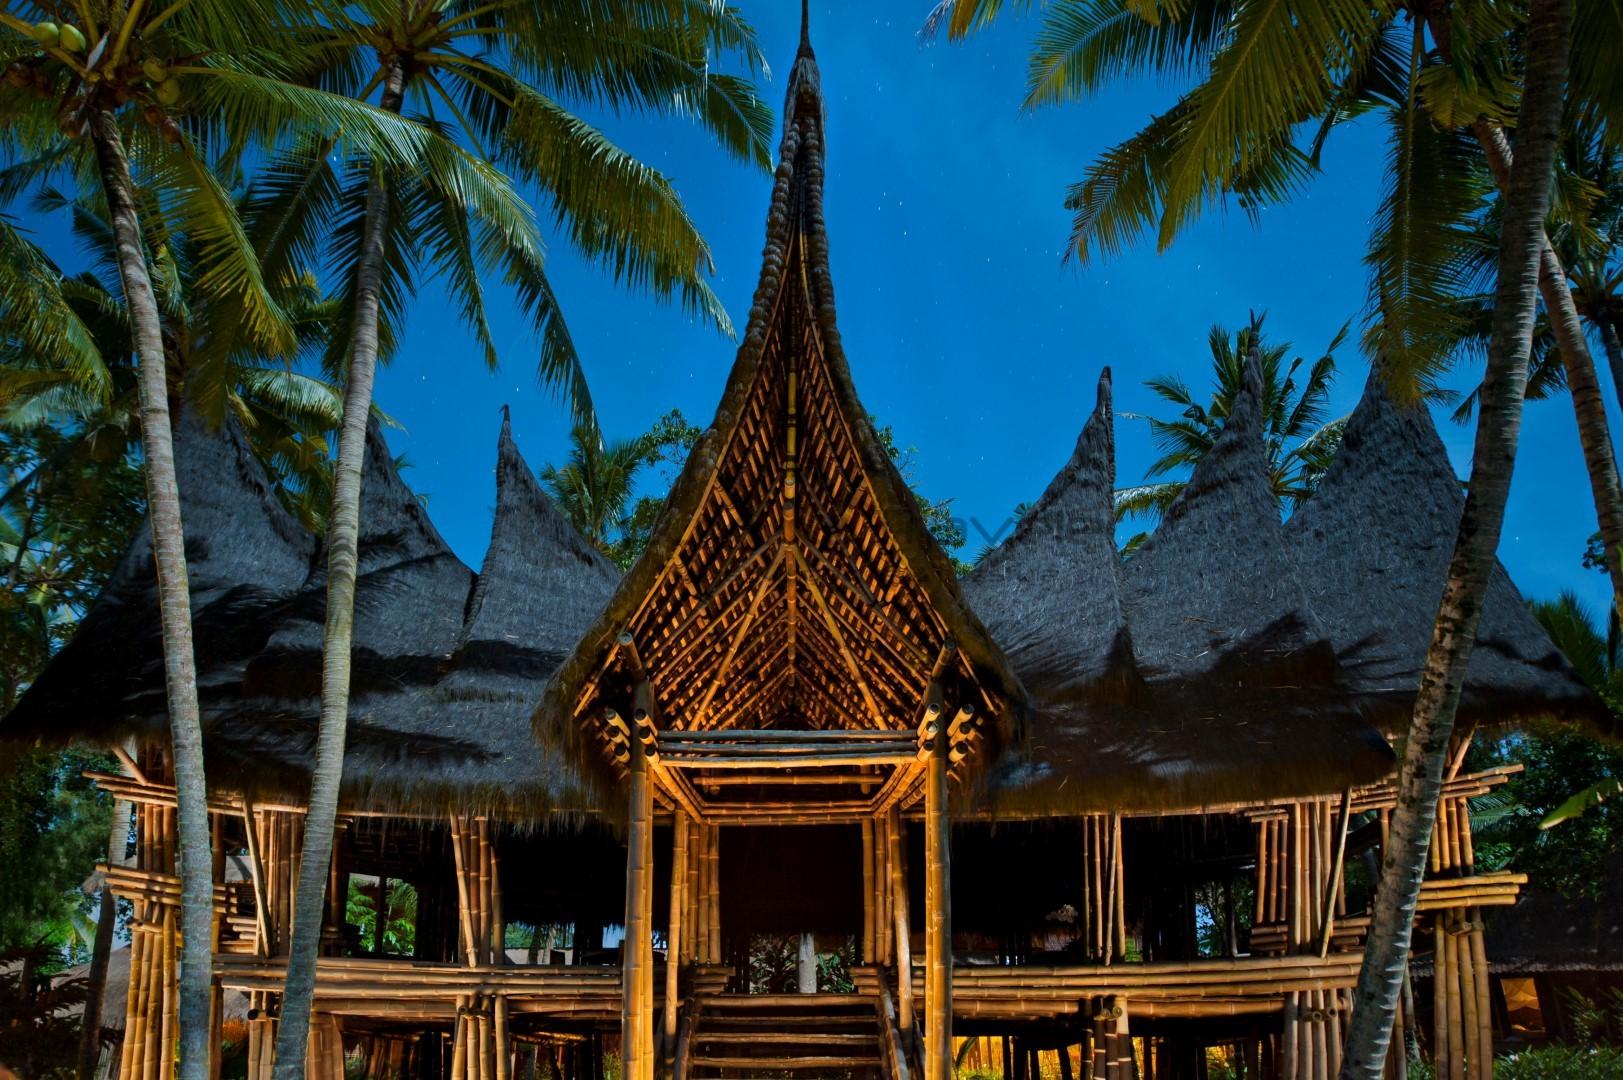 Bambu-Indah-Minang-House-night-ubud-bali